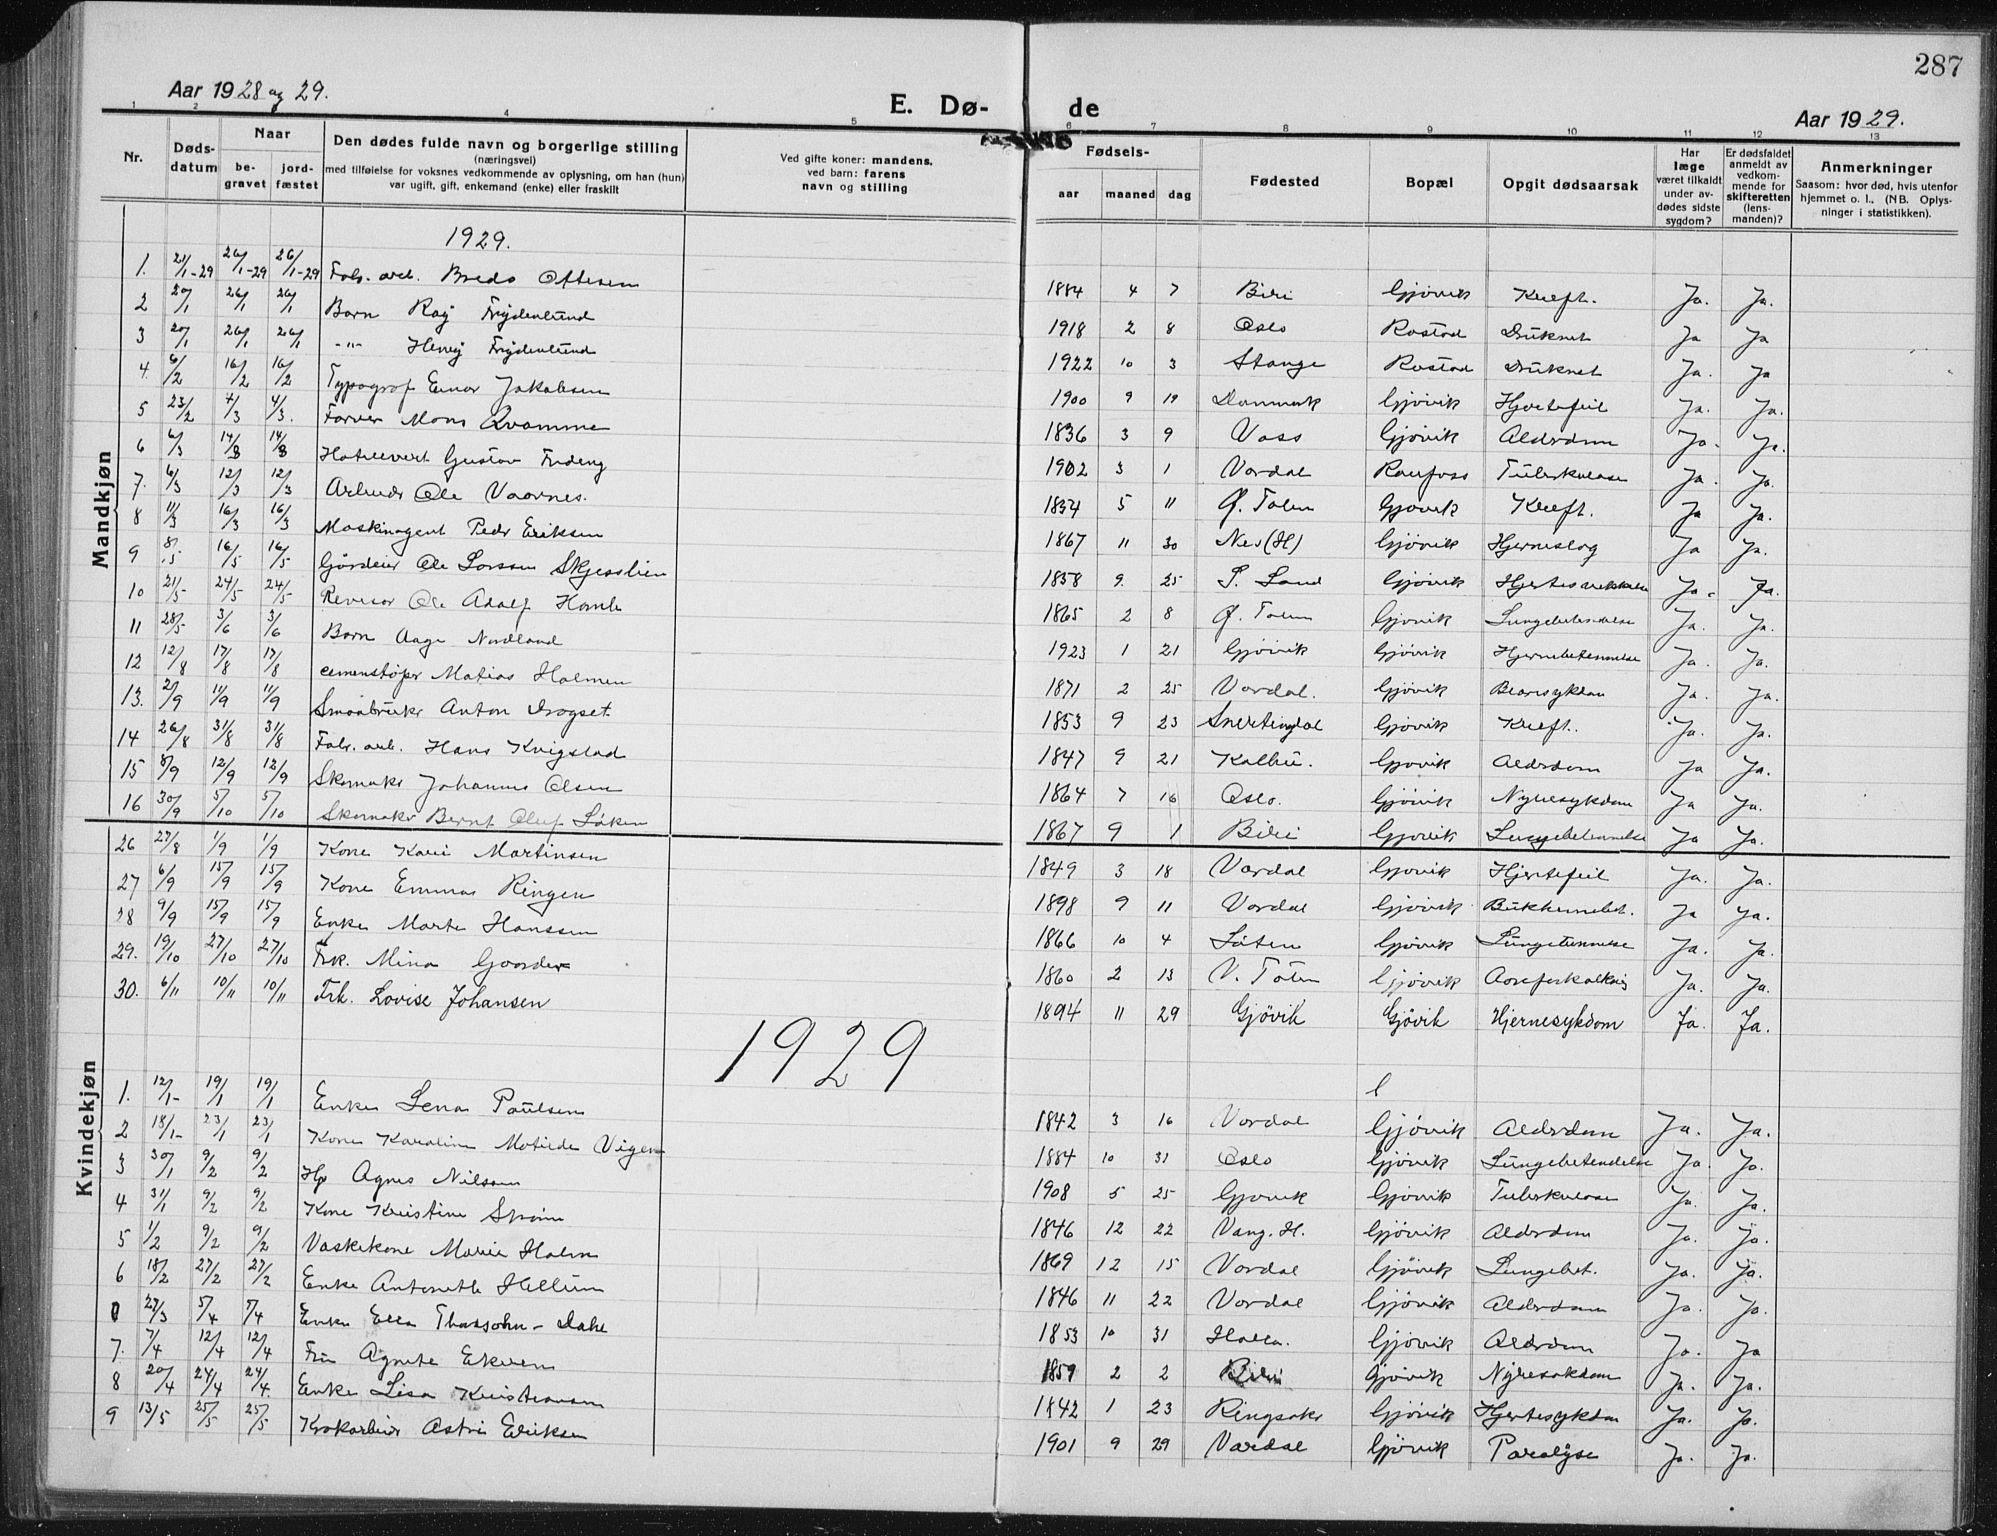 SAH, Vardal prestekontor, H/Ha/Hab/L0017: Klokkerbok nr. 17, 1922-1941, s. 287